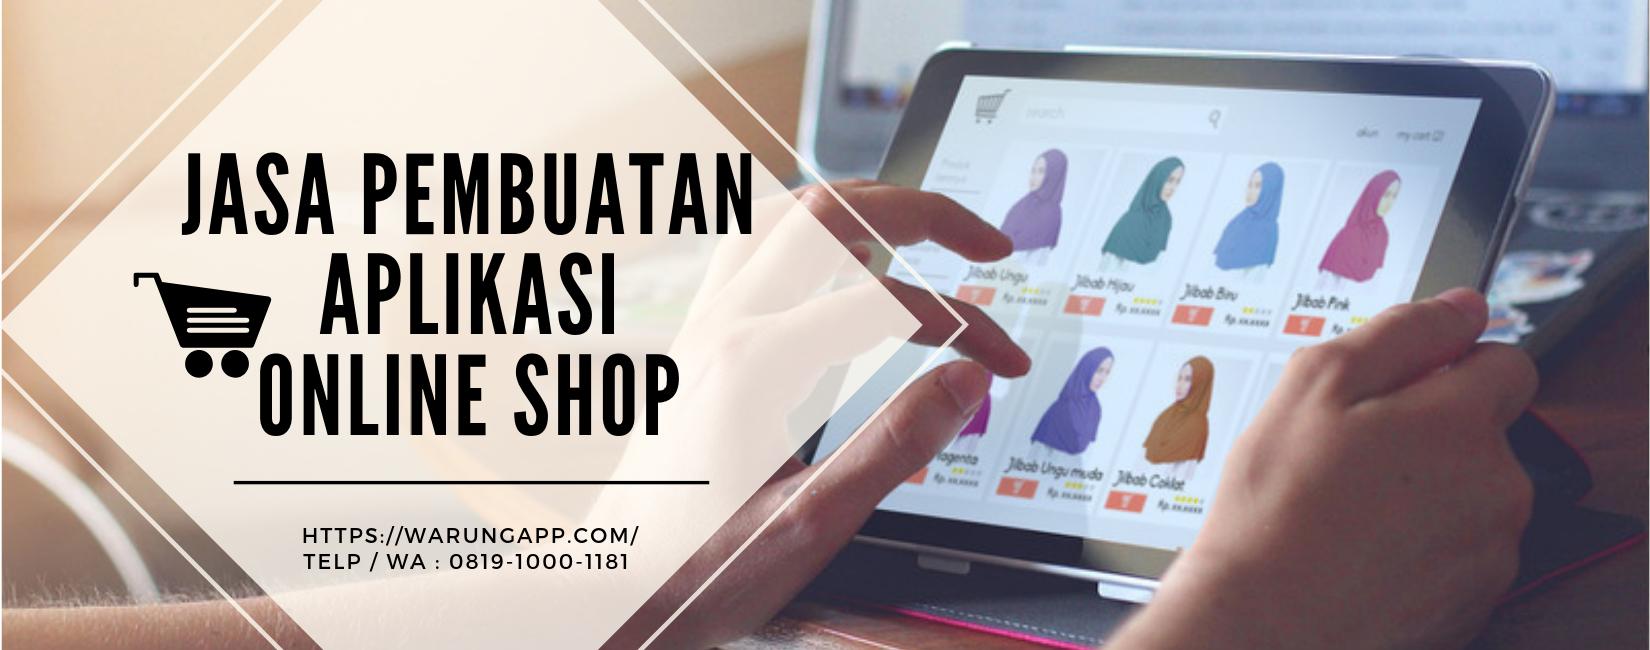 WarungApp - Jasa Pembuatan Aplikasi Usaha Online Shop (OlShop) Ecommerce